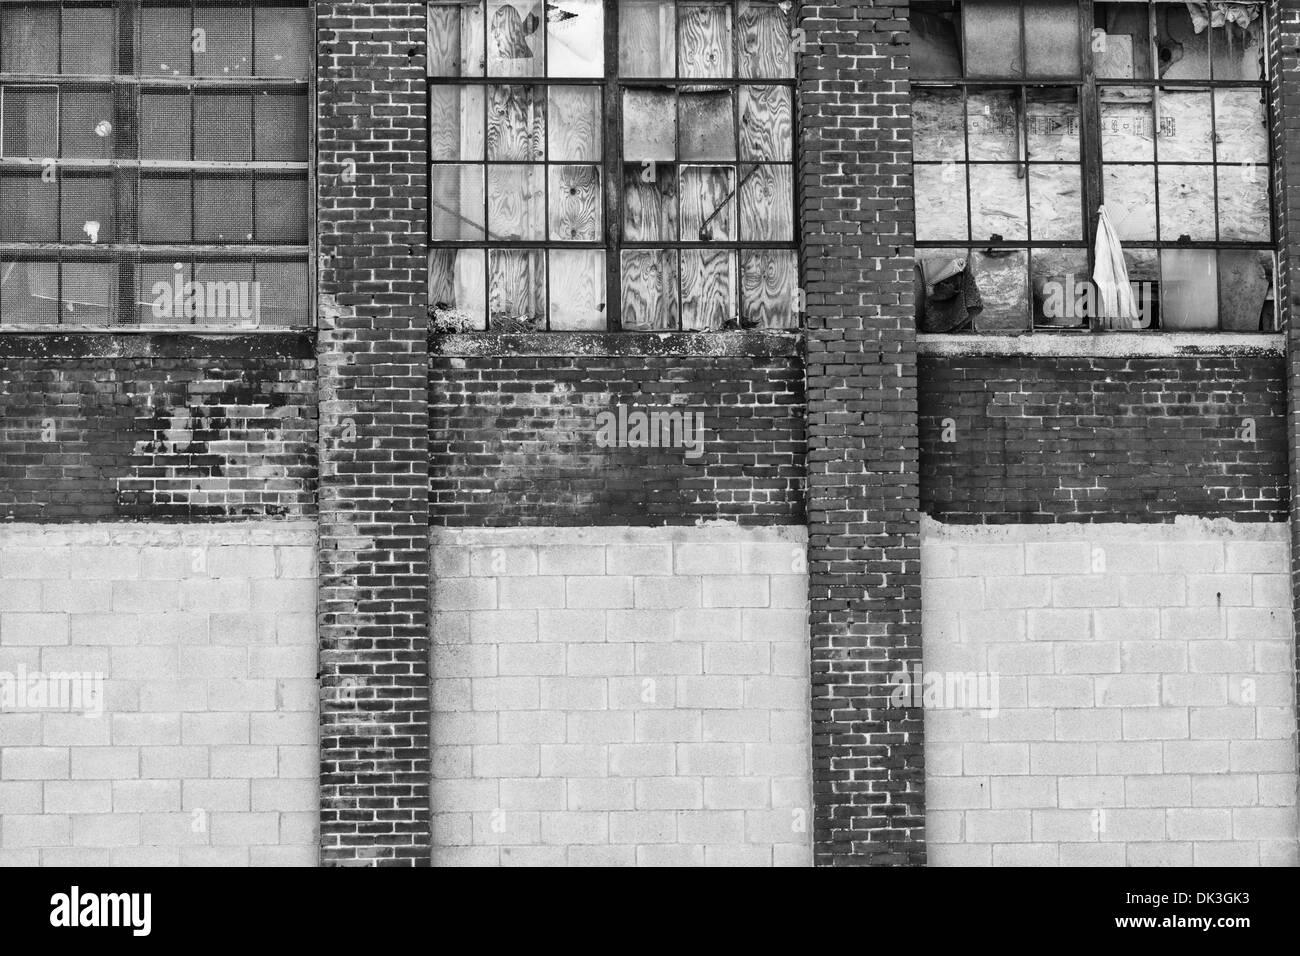 Urban Automotive Blight VIII - Abandoned Automotive Factory - Worn, Broken and Forgotten - Stock Image